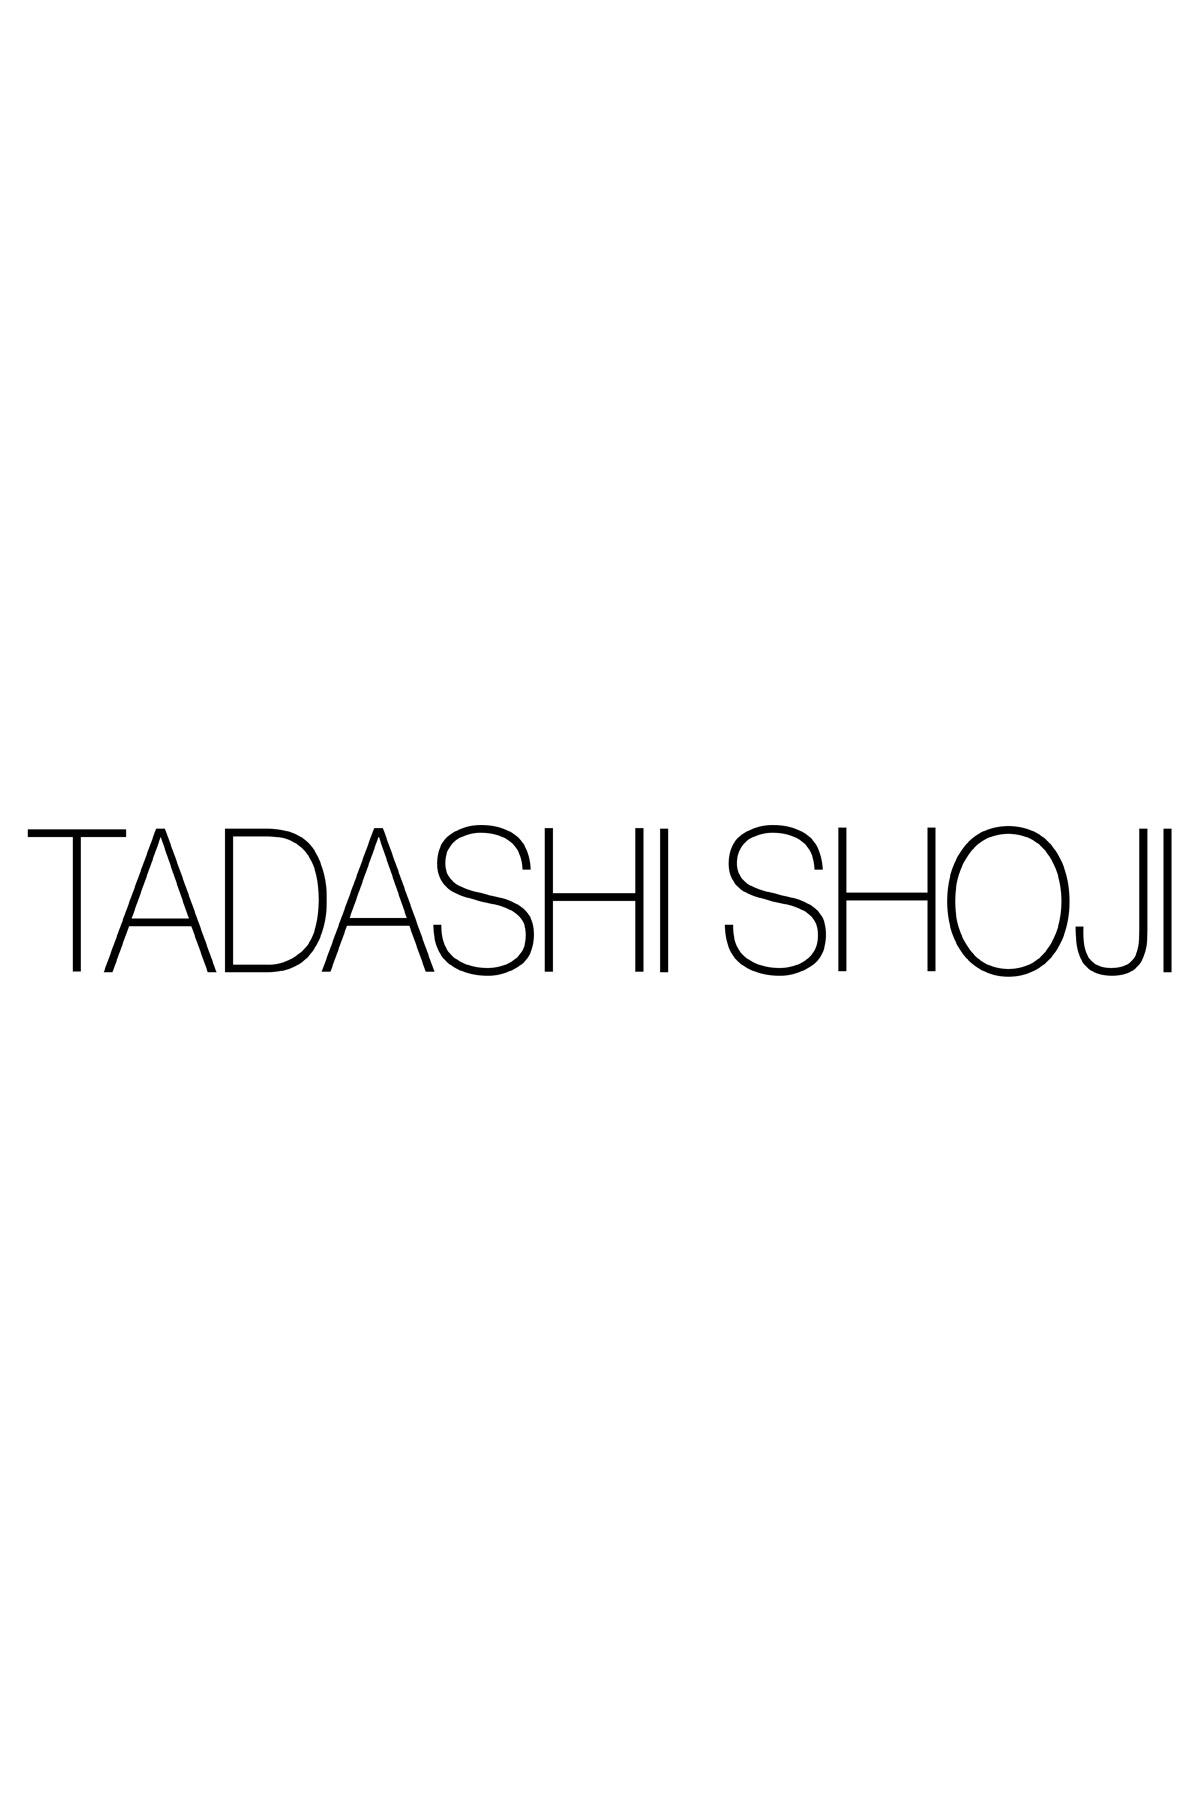 Tadashi Shoji - Peony Embroidered Rectangle Clutch